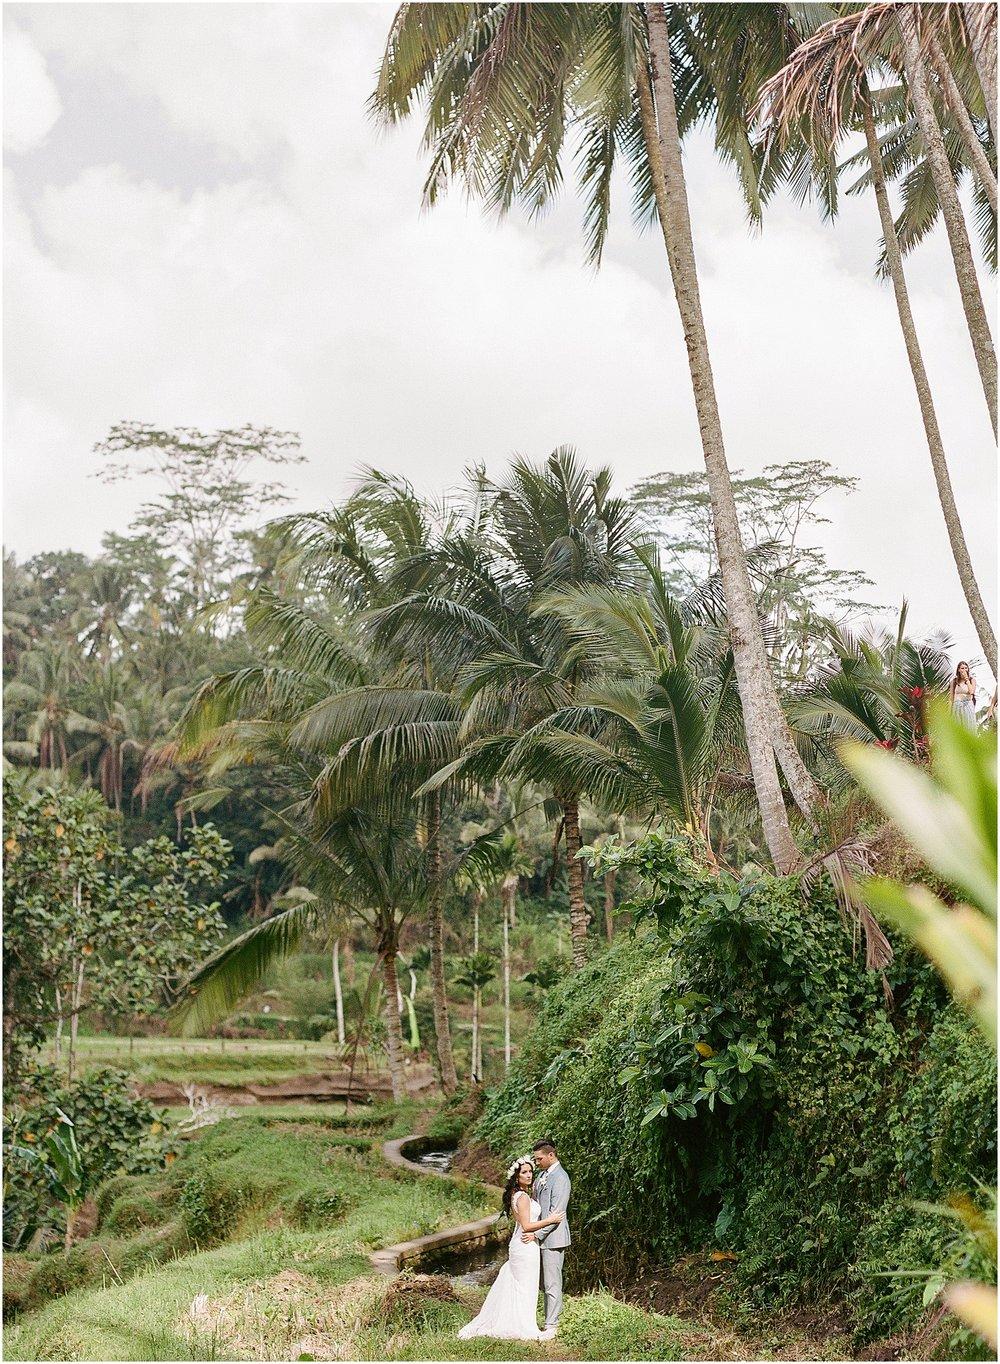 Destination | Ubud, Bali